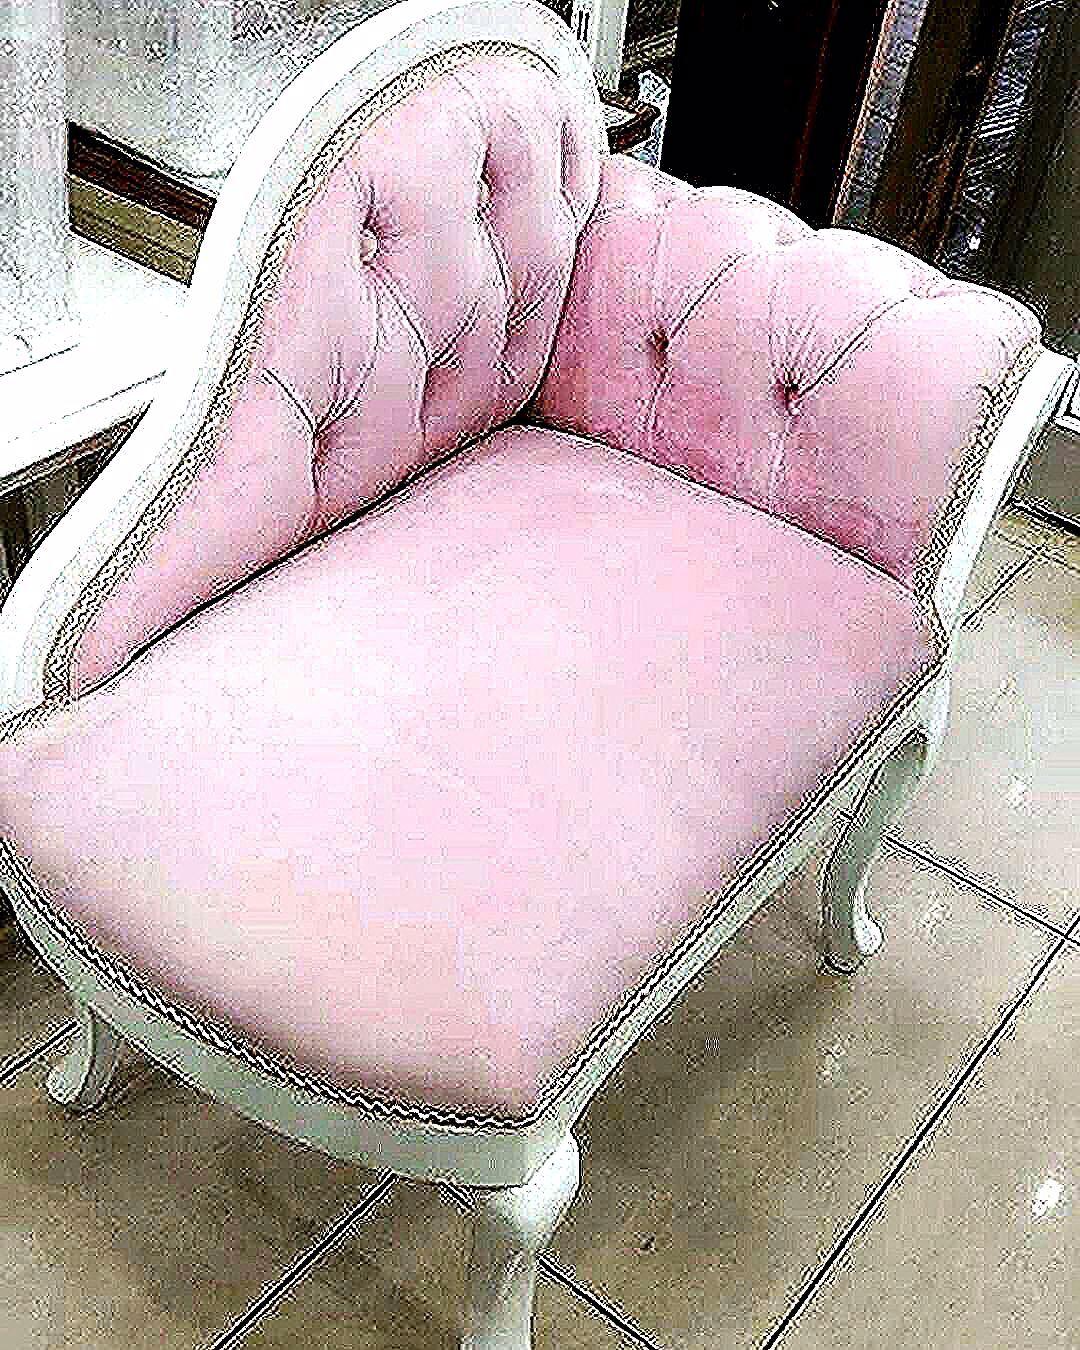 Koltuk Sandalye Masa Sehpa Zigon Dresuar Konsol Komot Ayna Berjer Jozefin Puf Desing Vitrin Homdesing Dekorasyon Tvunitesi Mobi In 2020 Love Seat Chaise Lounge Chaise